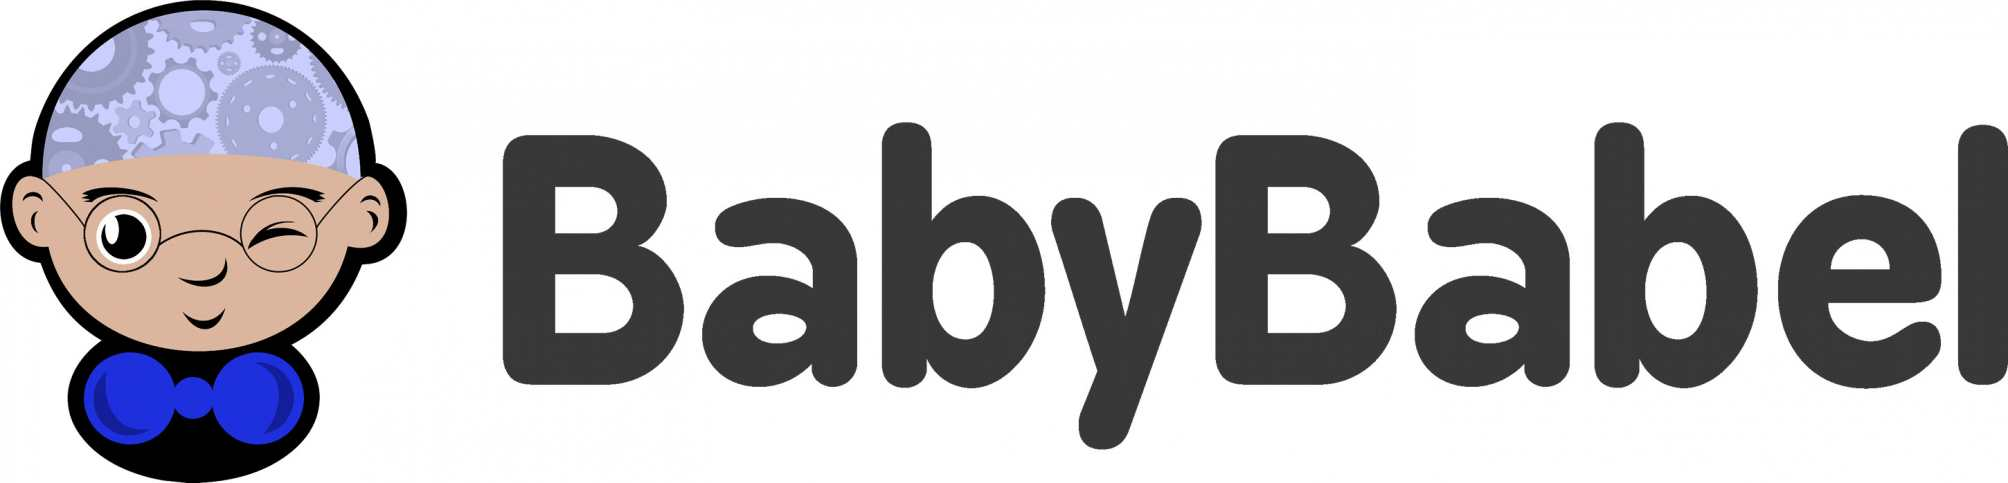 BabyBabel Logo